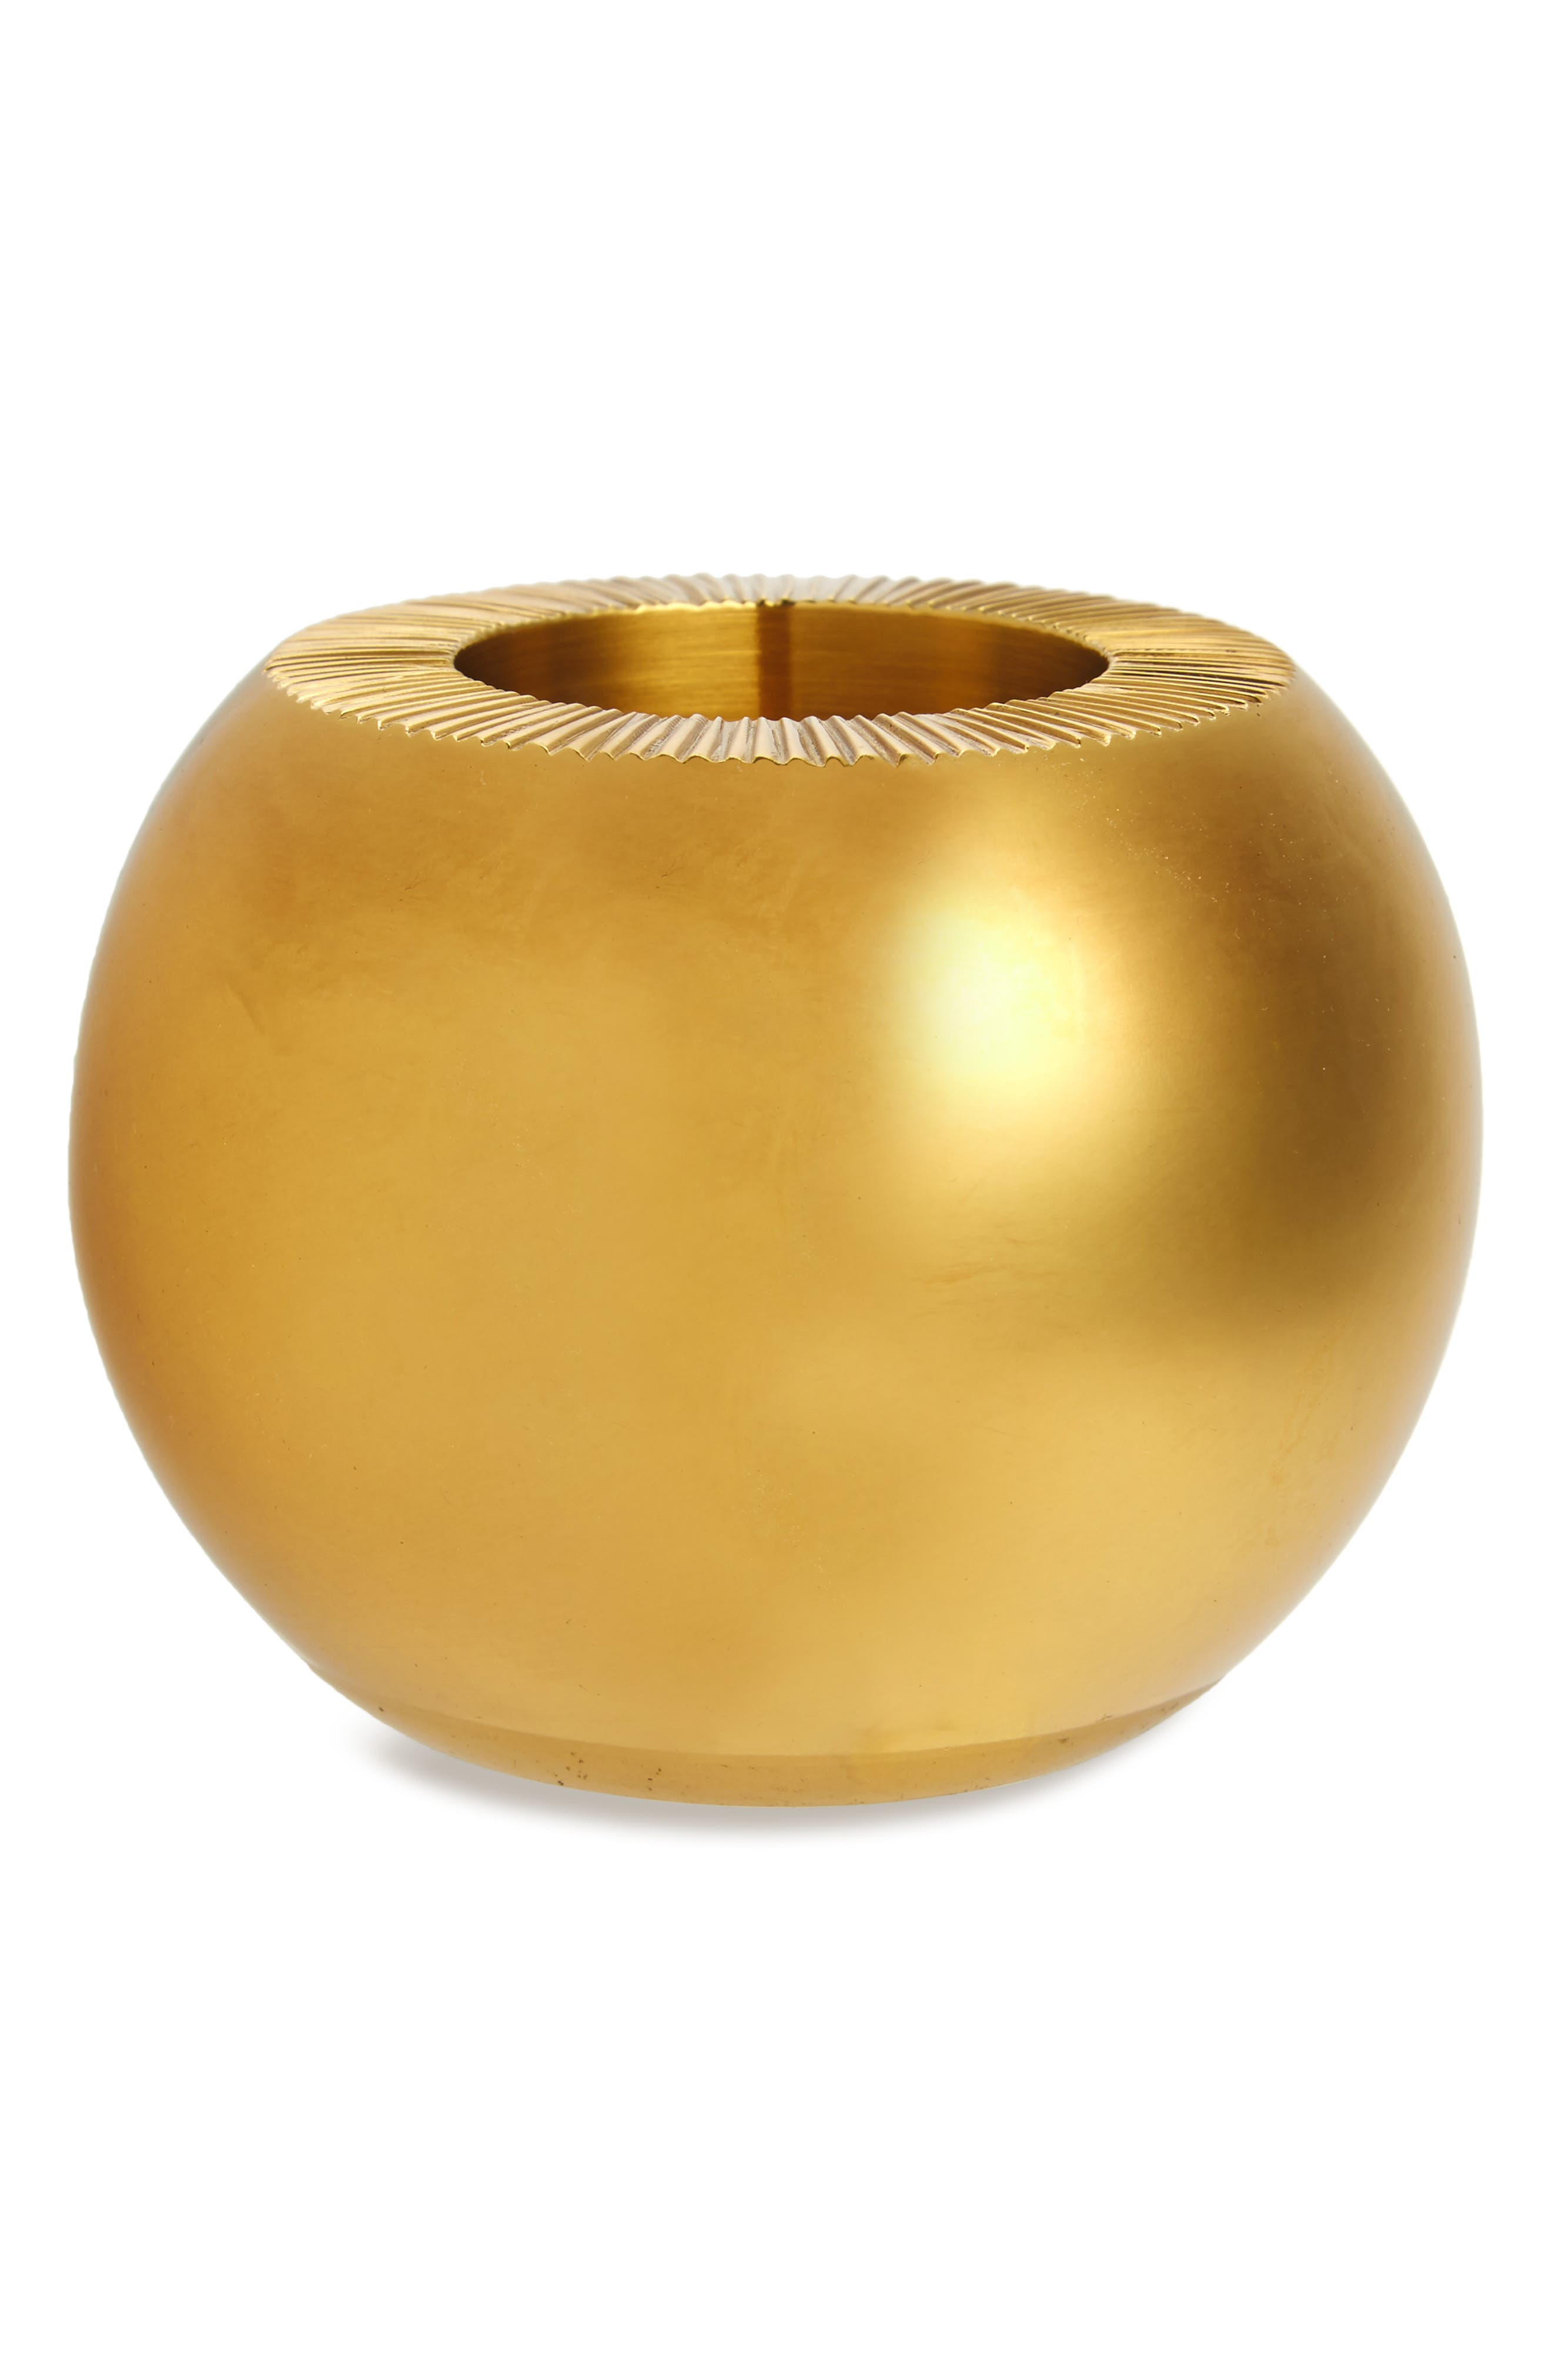 Brass Match Holder,                             Main thumbnail 1, color,                             METALLIC GOLD